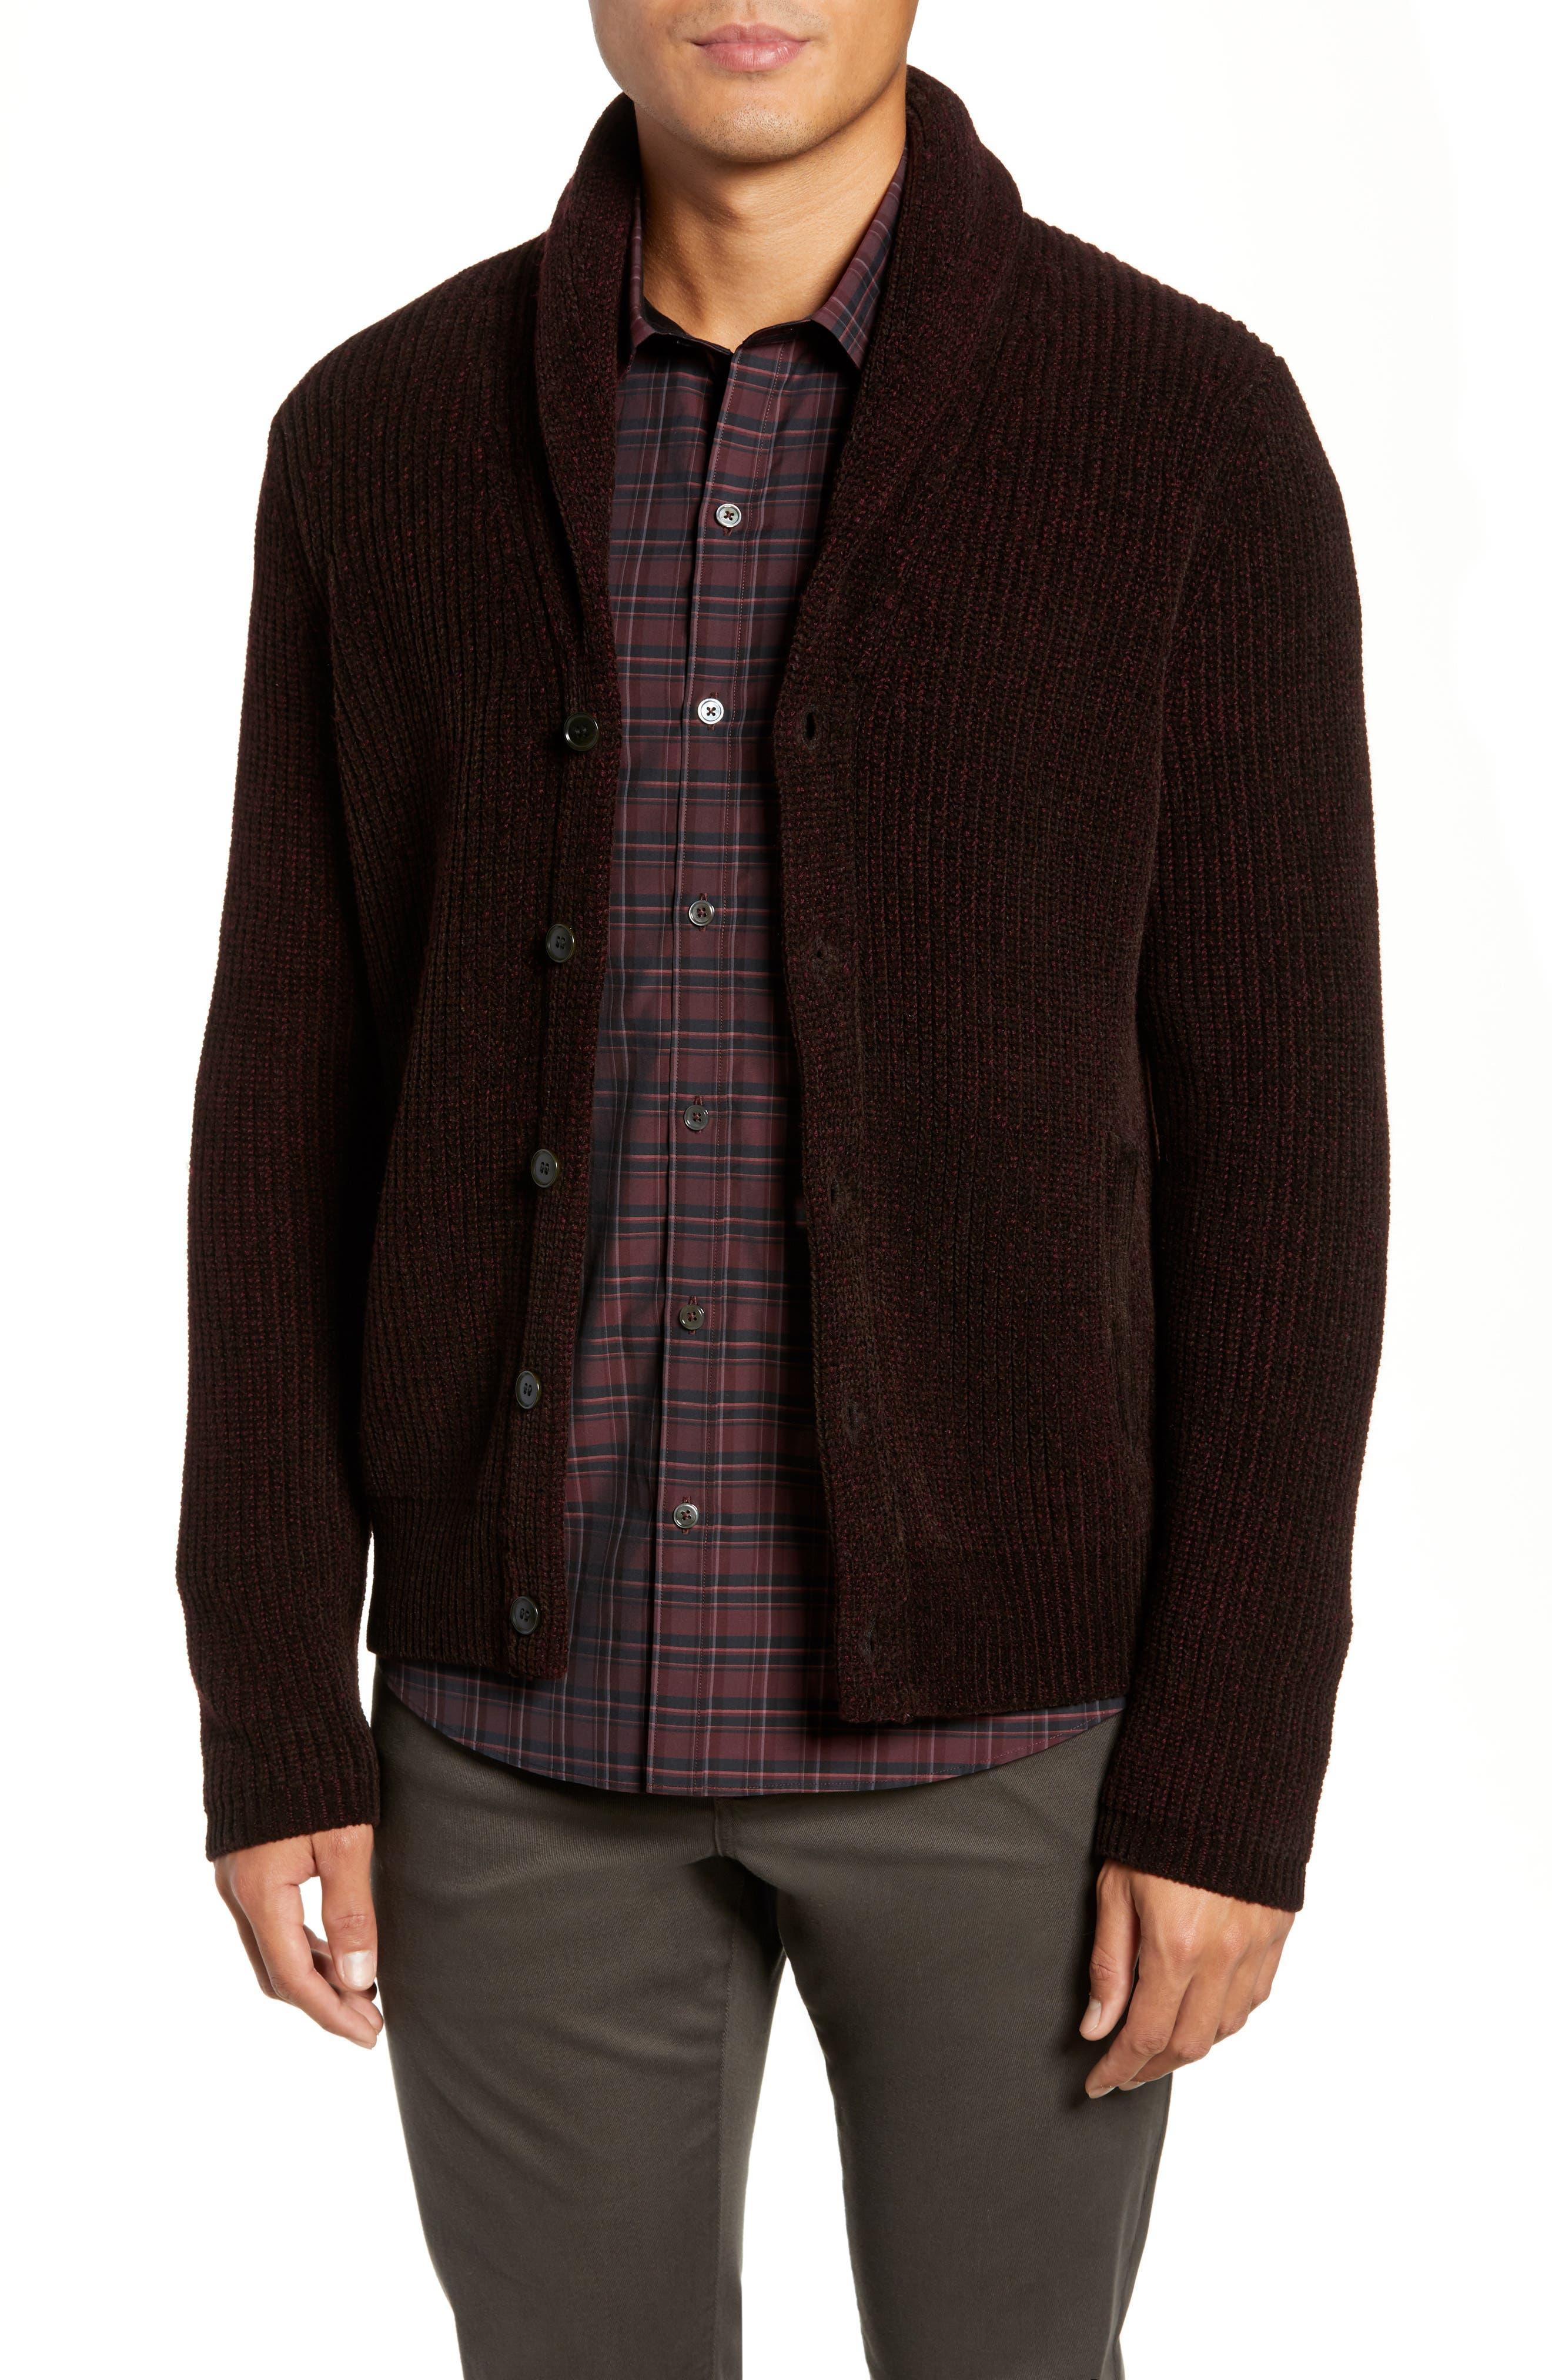 Quincy Regular Fit Shawl Collar Cardigan,                         Main,                         color, BROWN